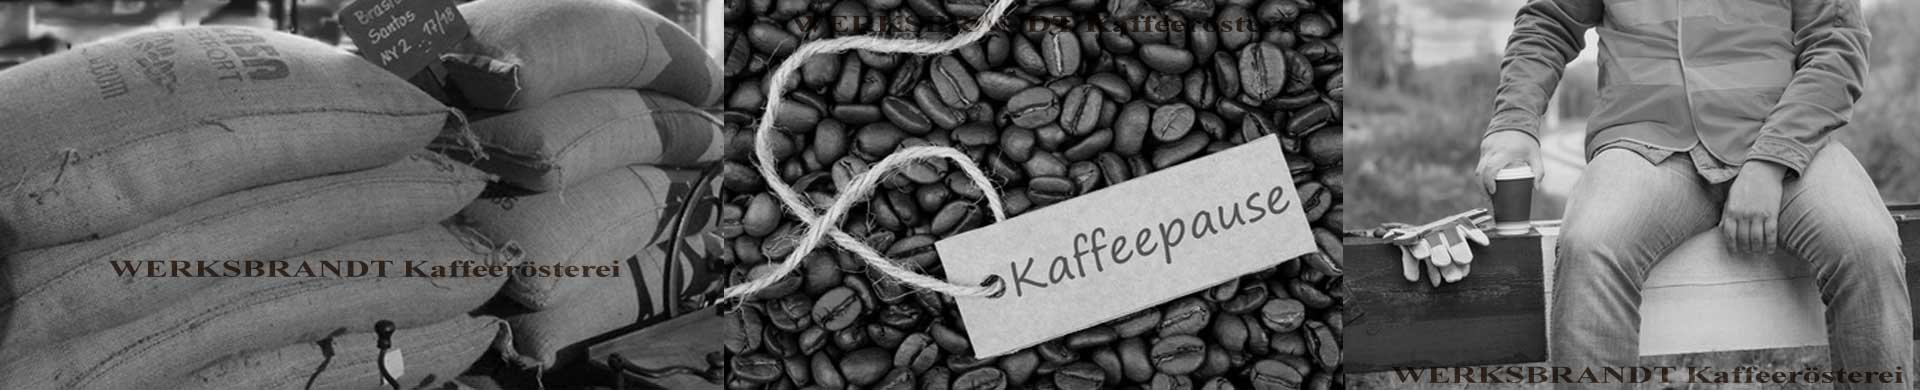 WERKSBRANDT Kaffeerösterei Impressionen Kaffeesäcke Kaffeepause